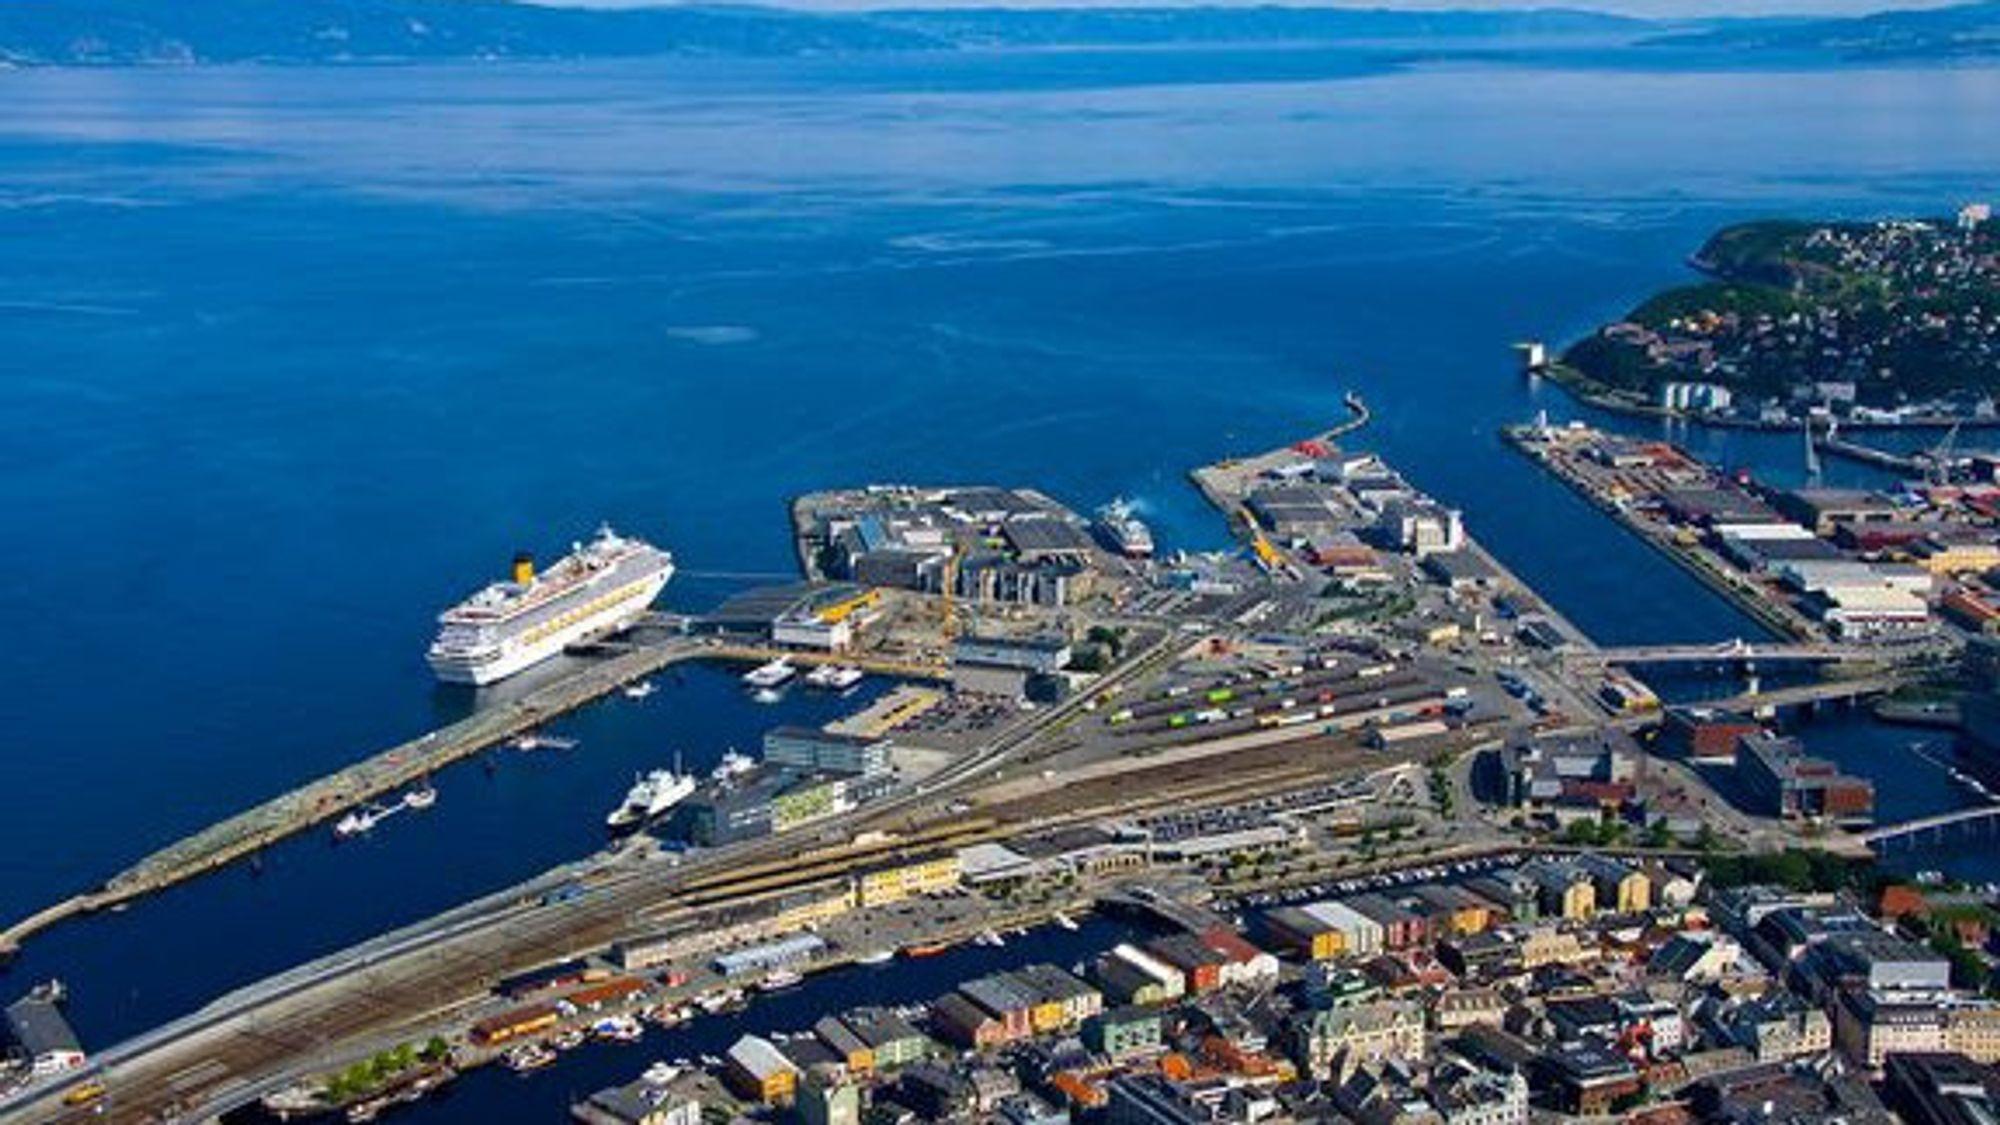 Presset fra de som vil bruke Trondheim havn til boliger og kontorer øker. Nå skal forskerne undersøke om mindre fraktebåter kan løse floken.